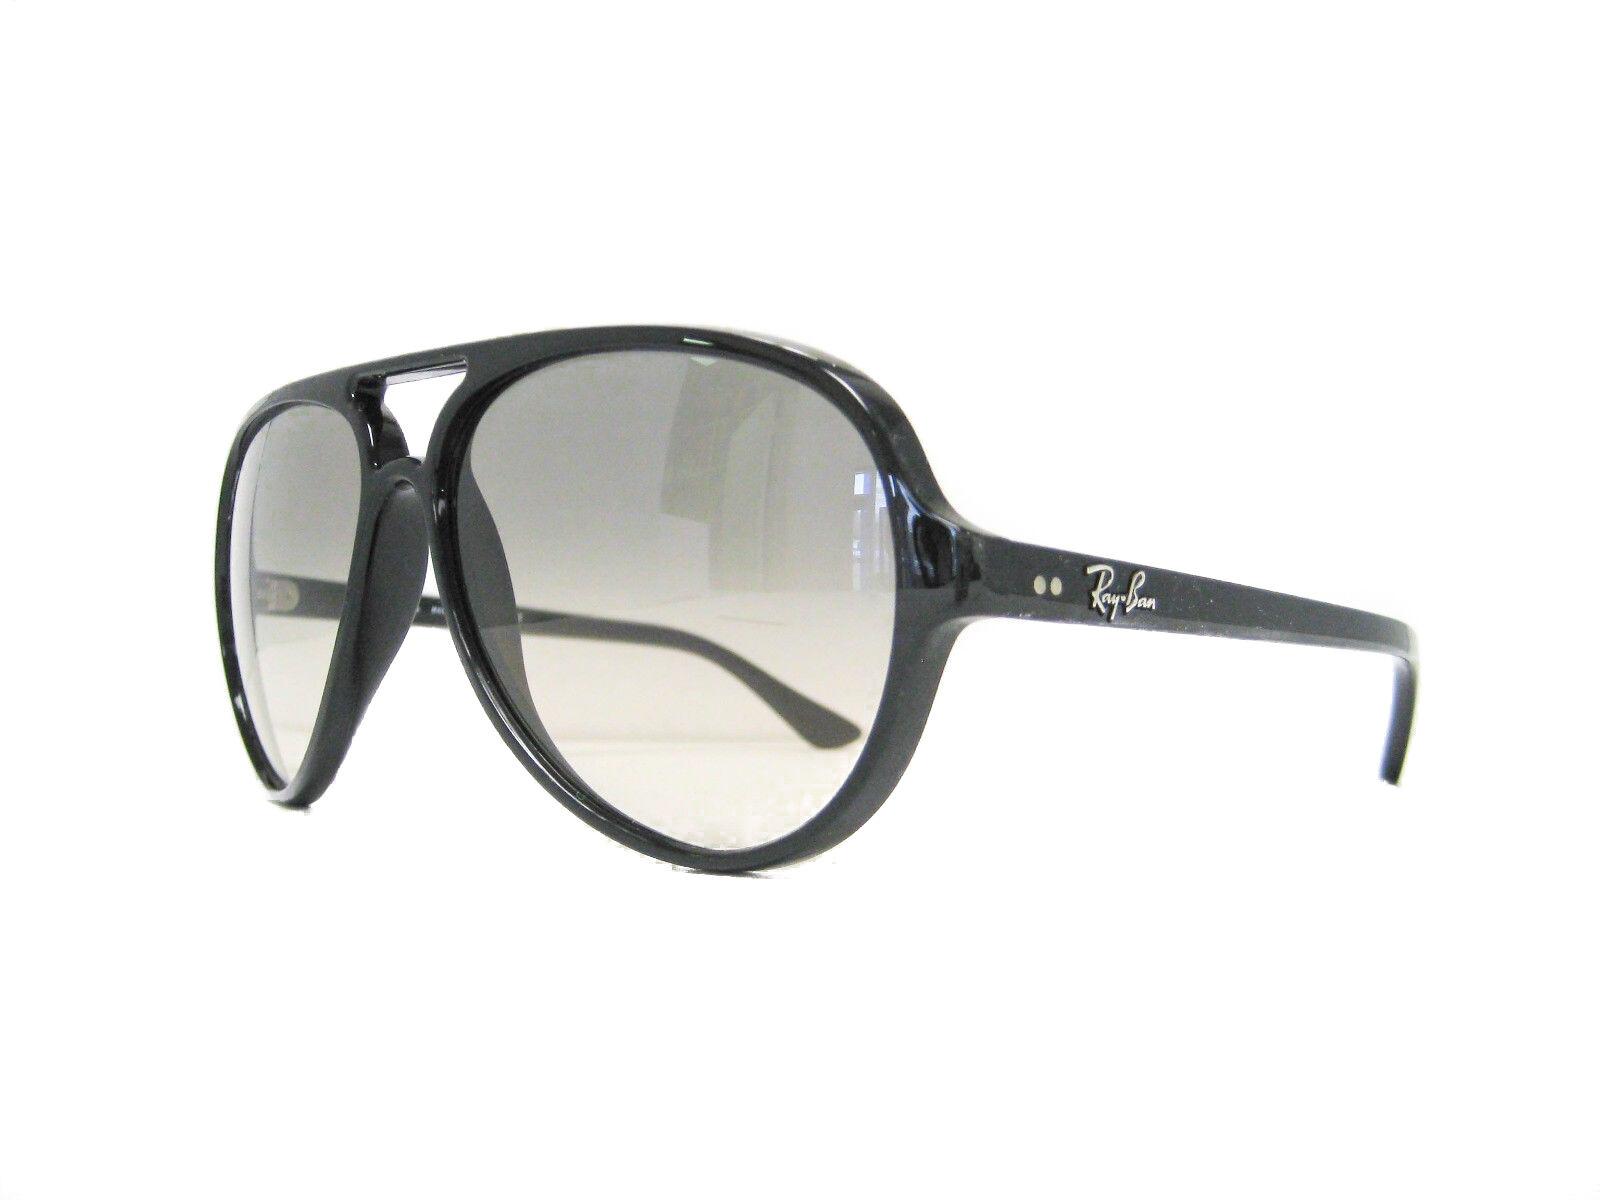 NEW Ray-Ban RB 4125 Black 601 32 Cats 5000 Sunglasses Black Grey ...